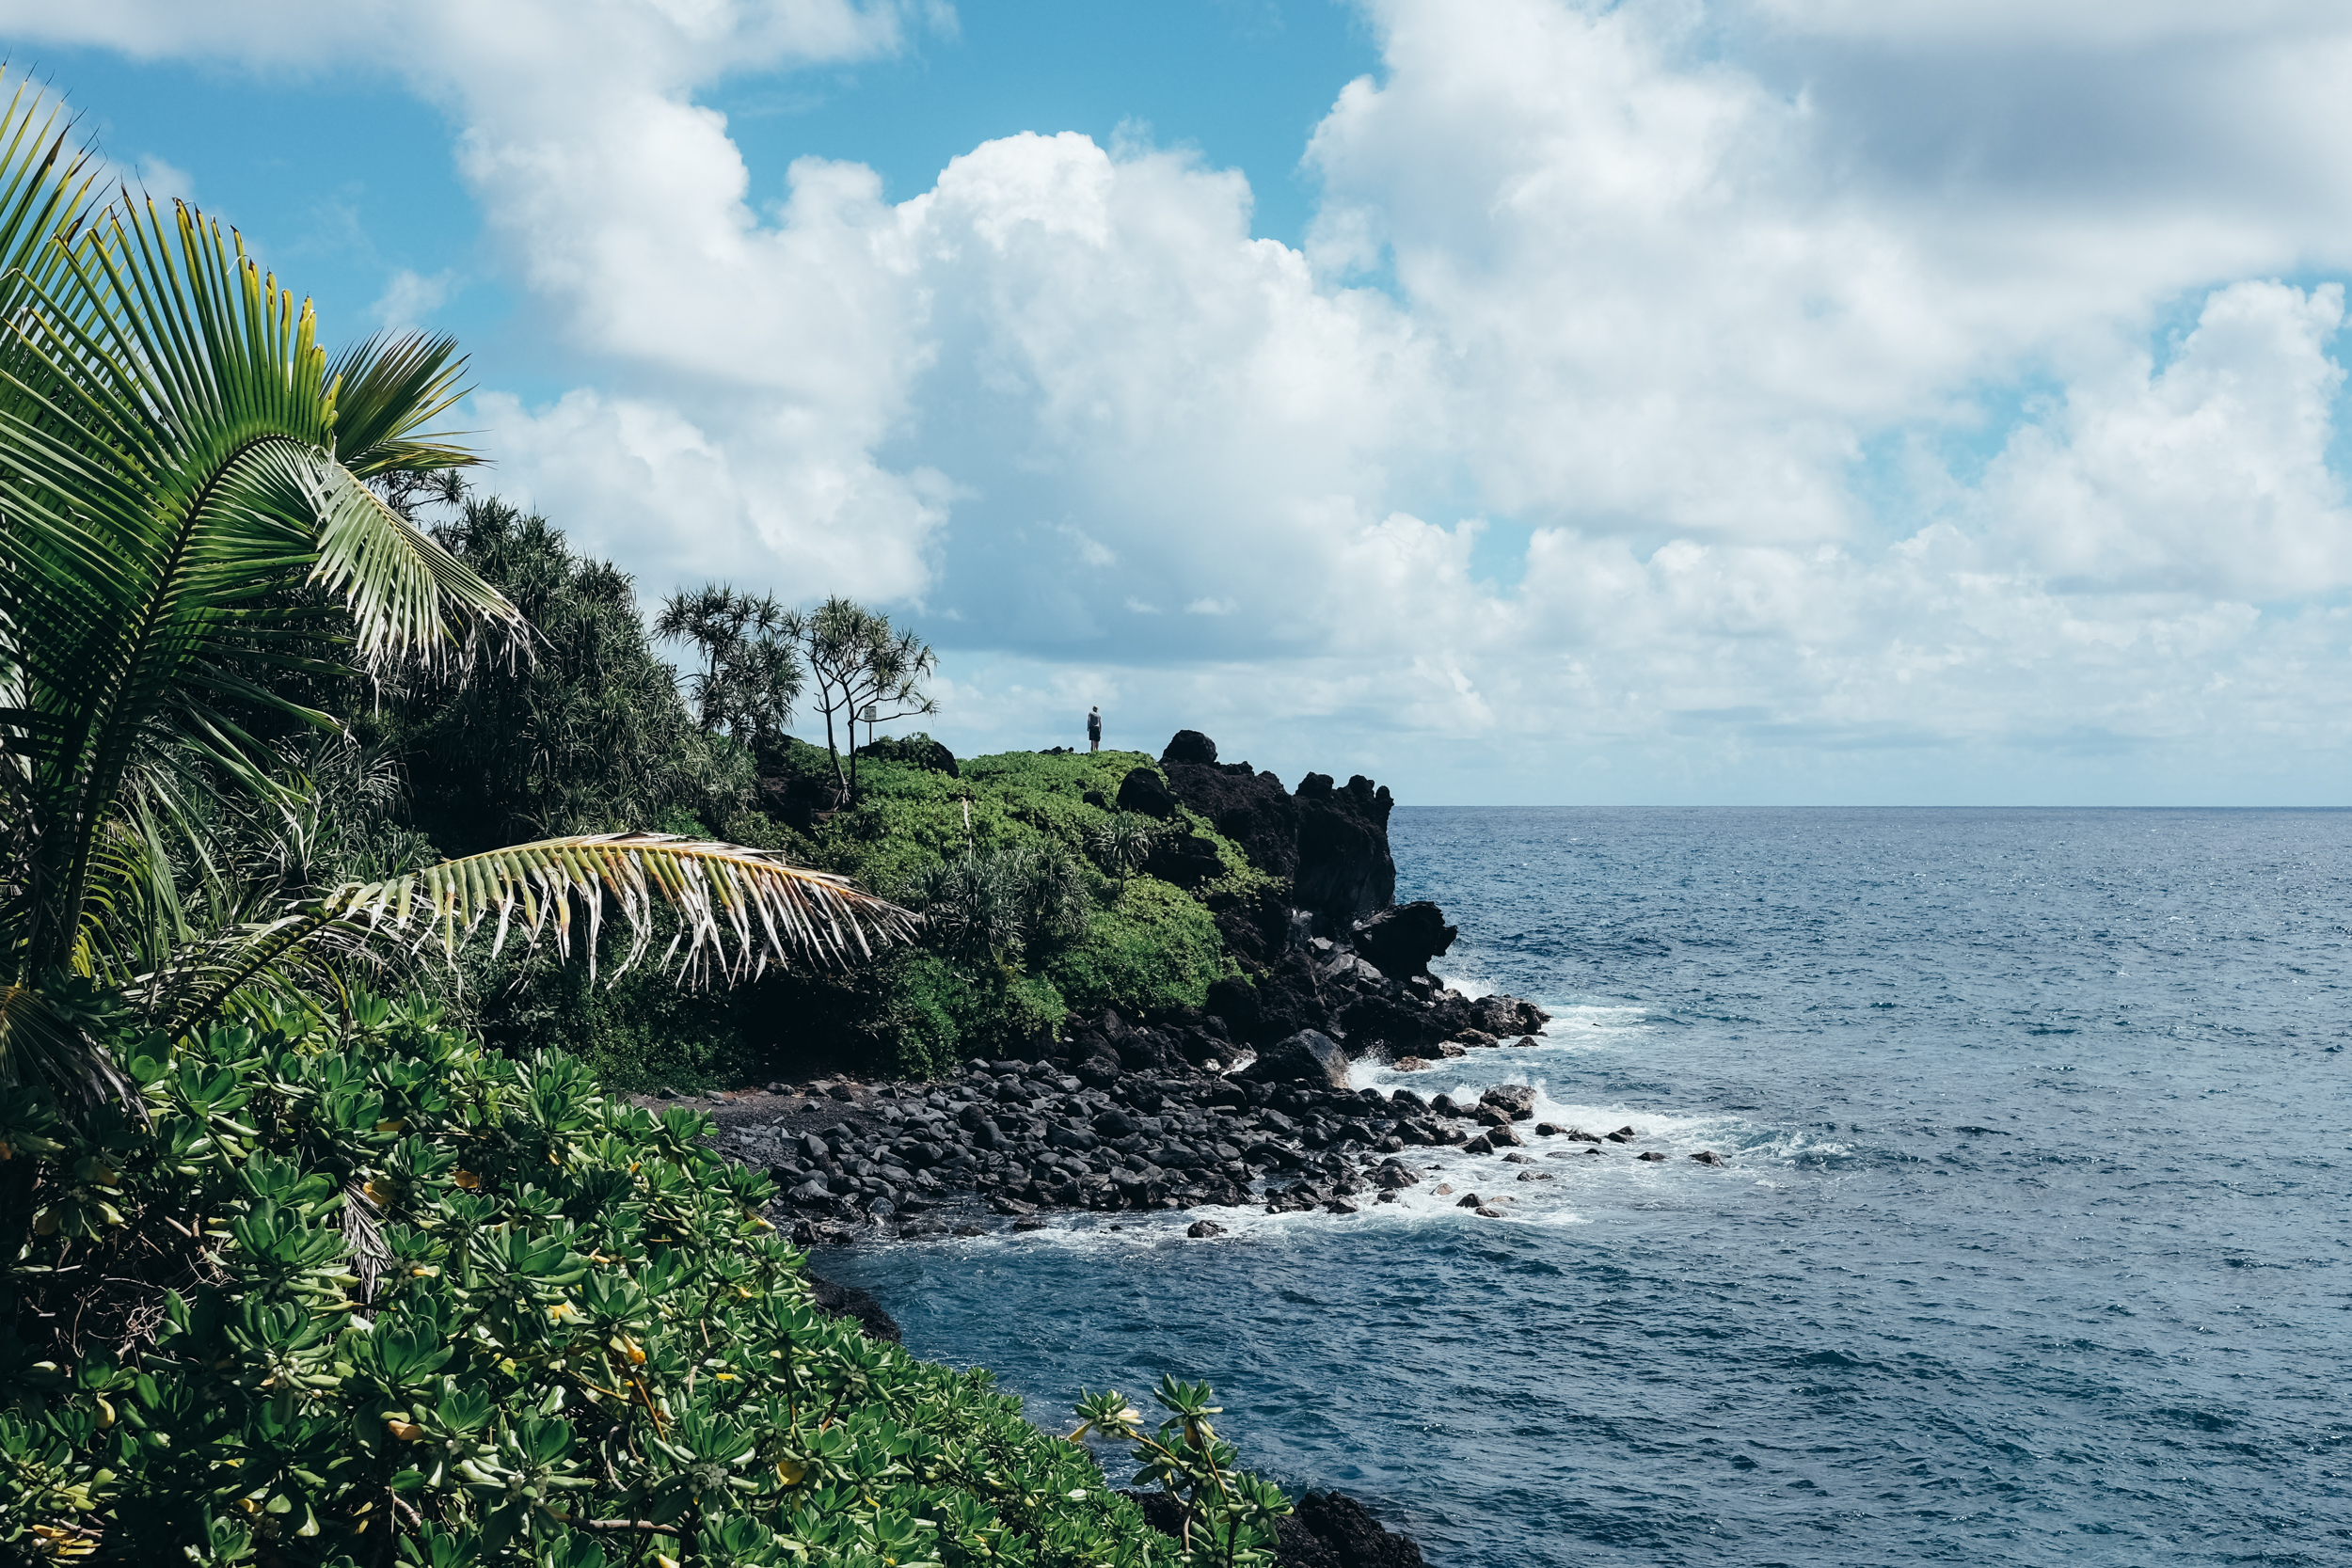 Maui056.jpg